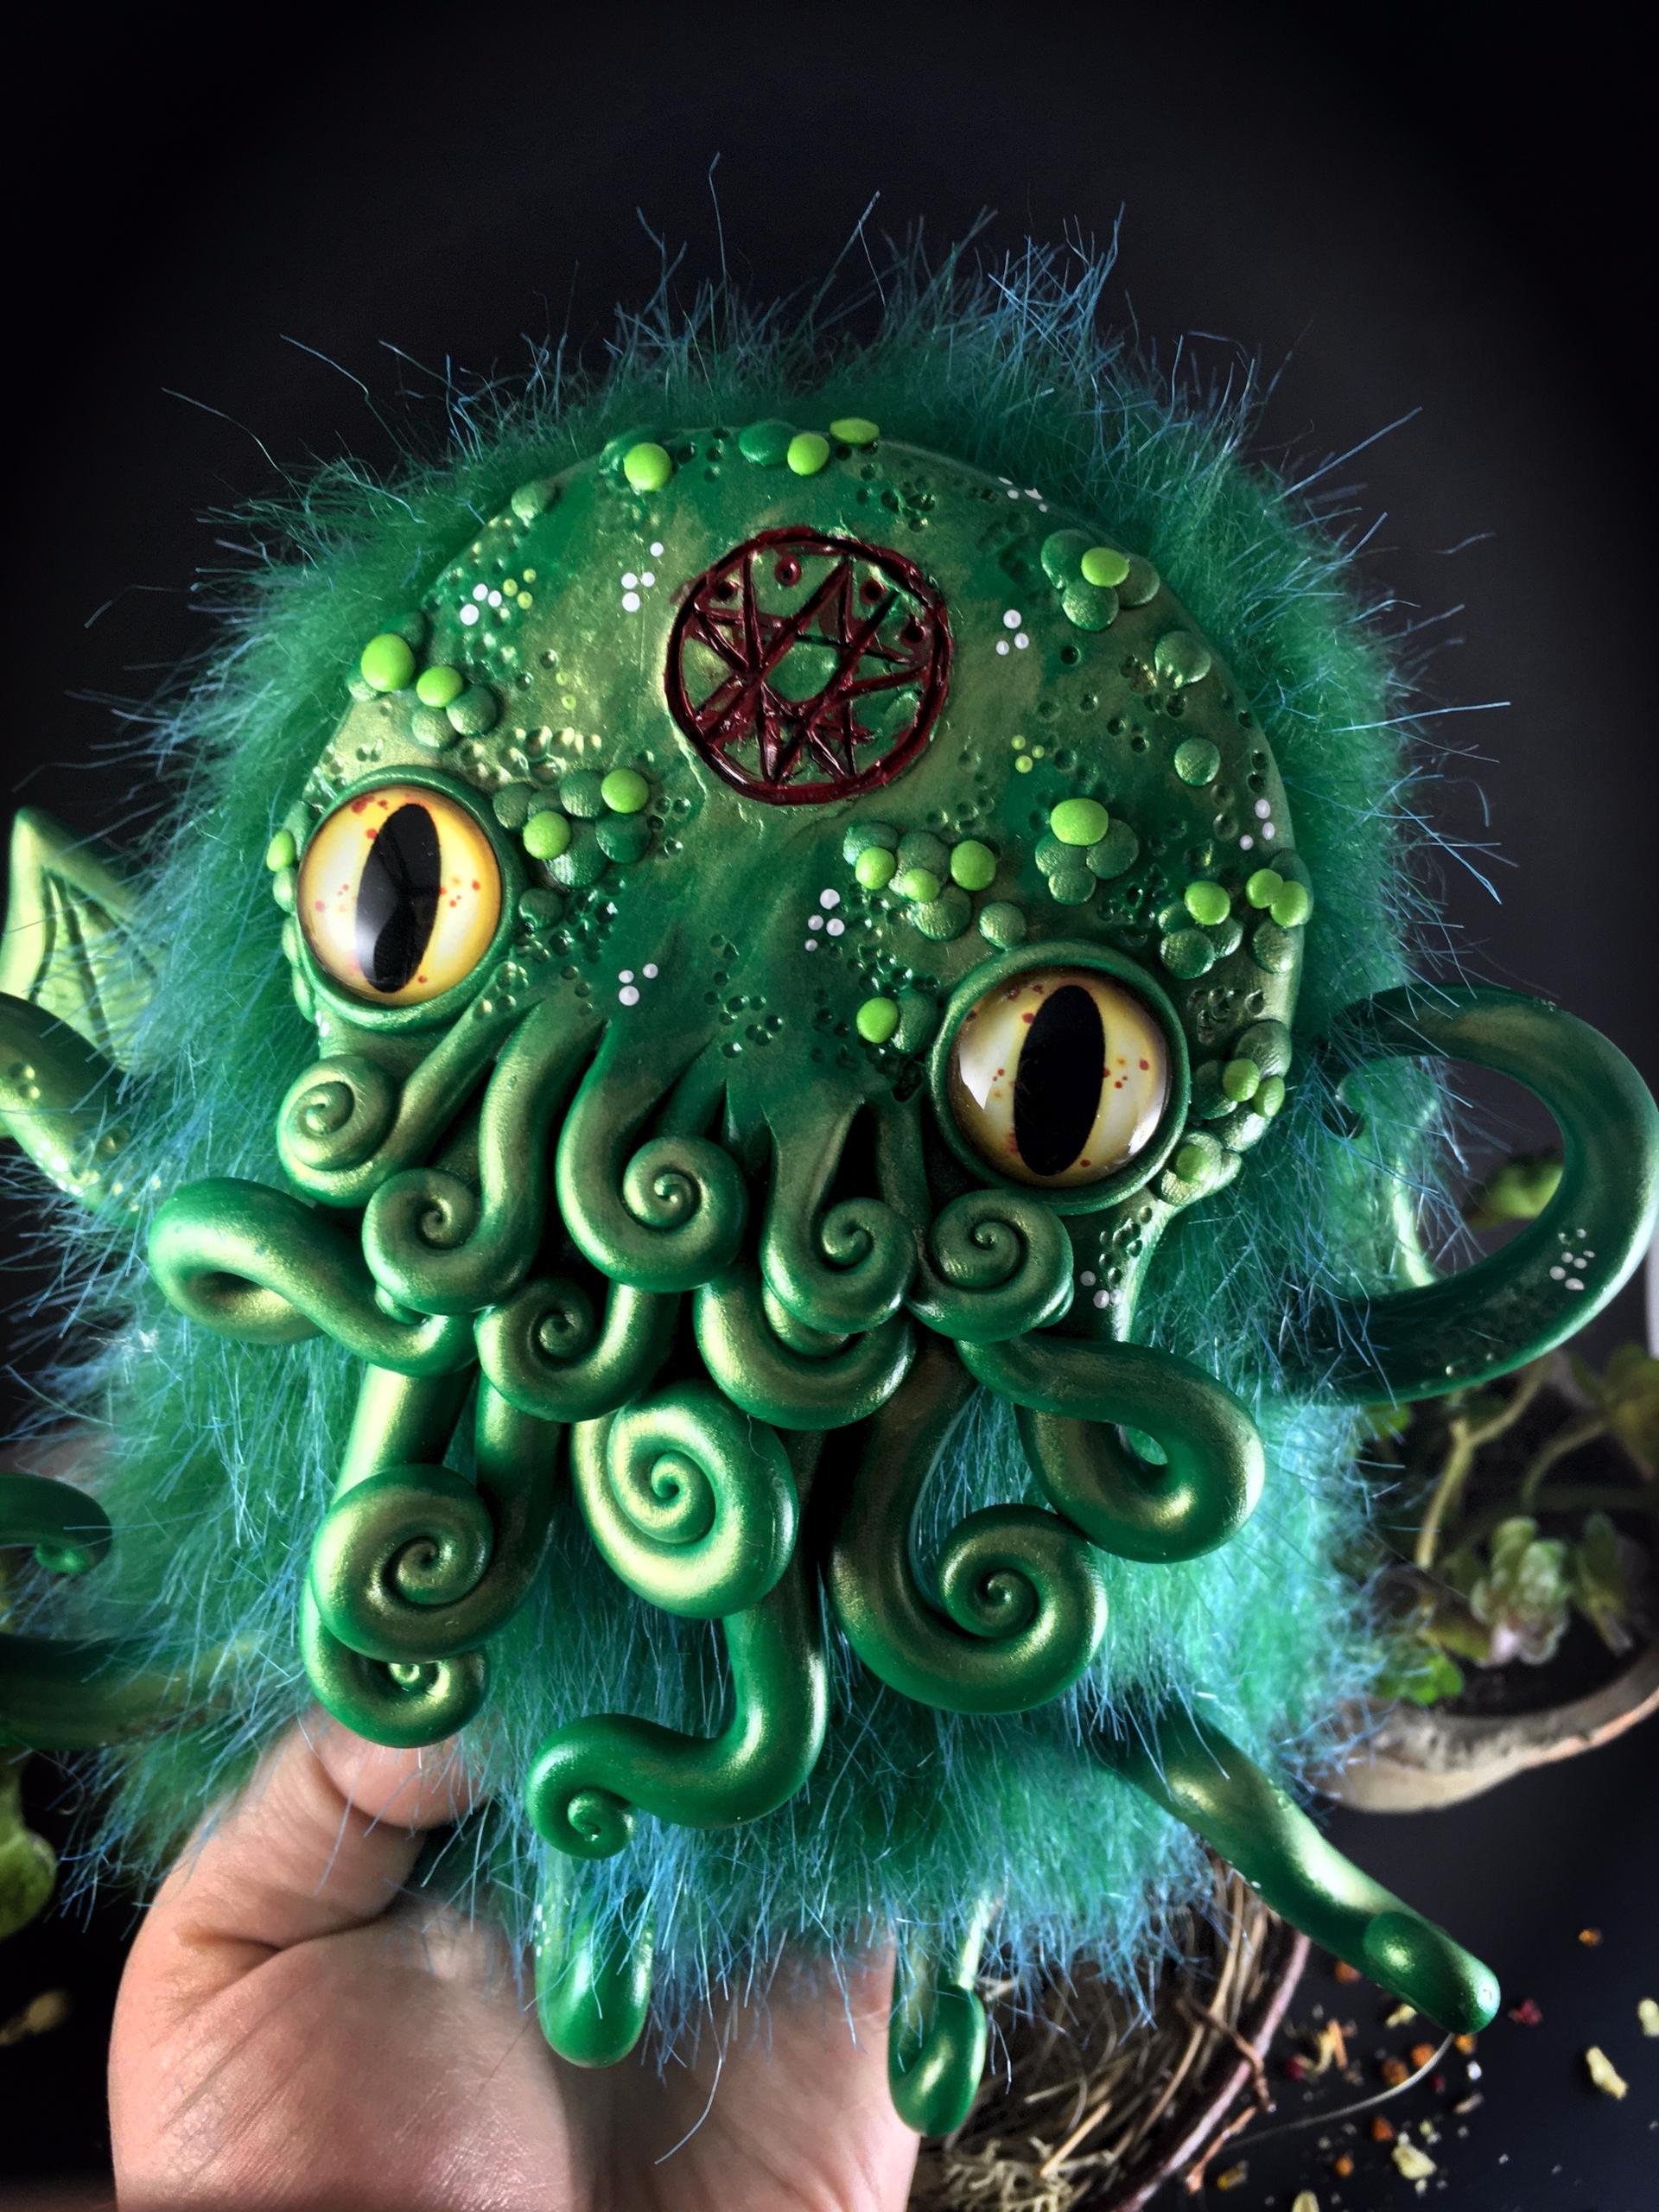 favourite monster growing oppor - caryscuttlefish | ello